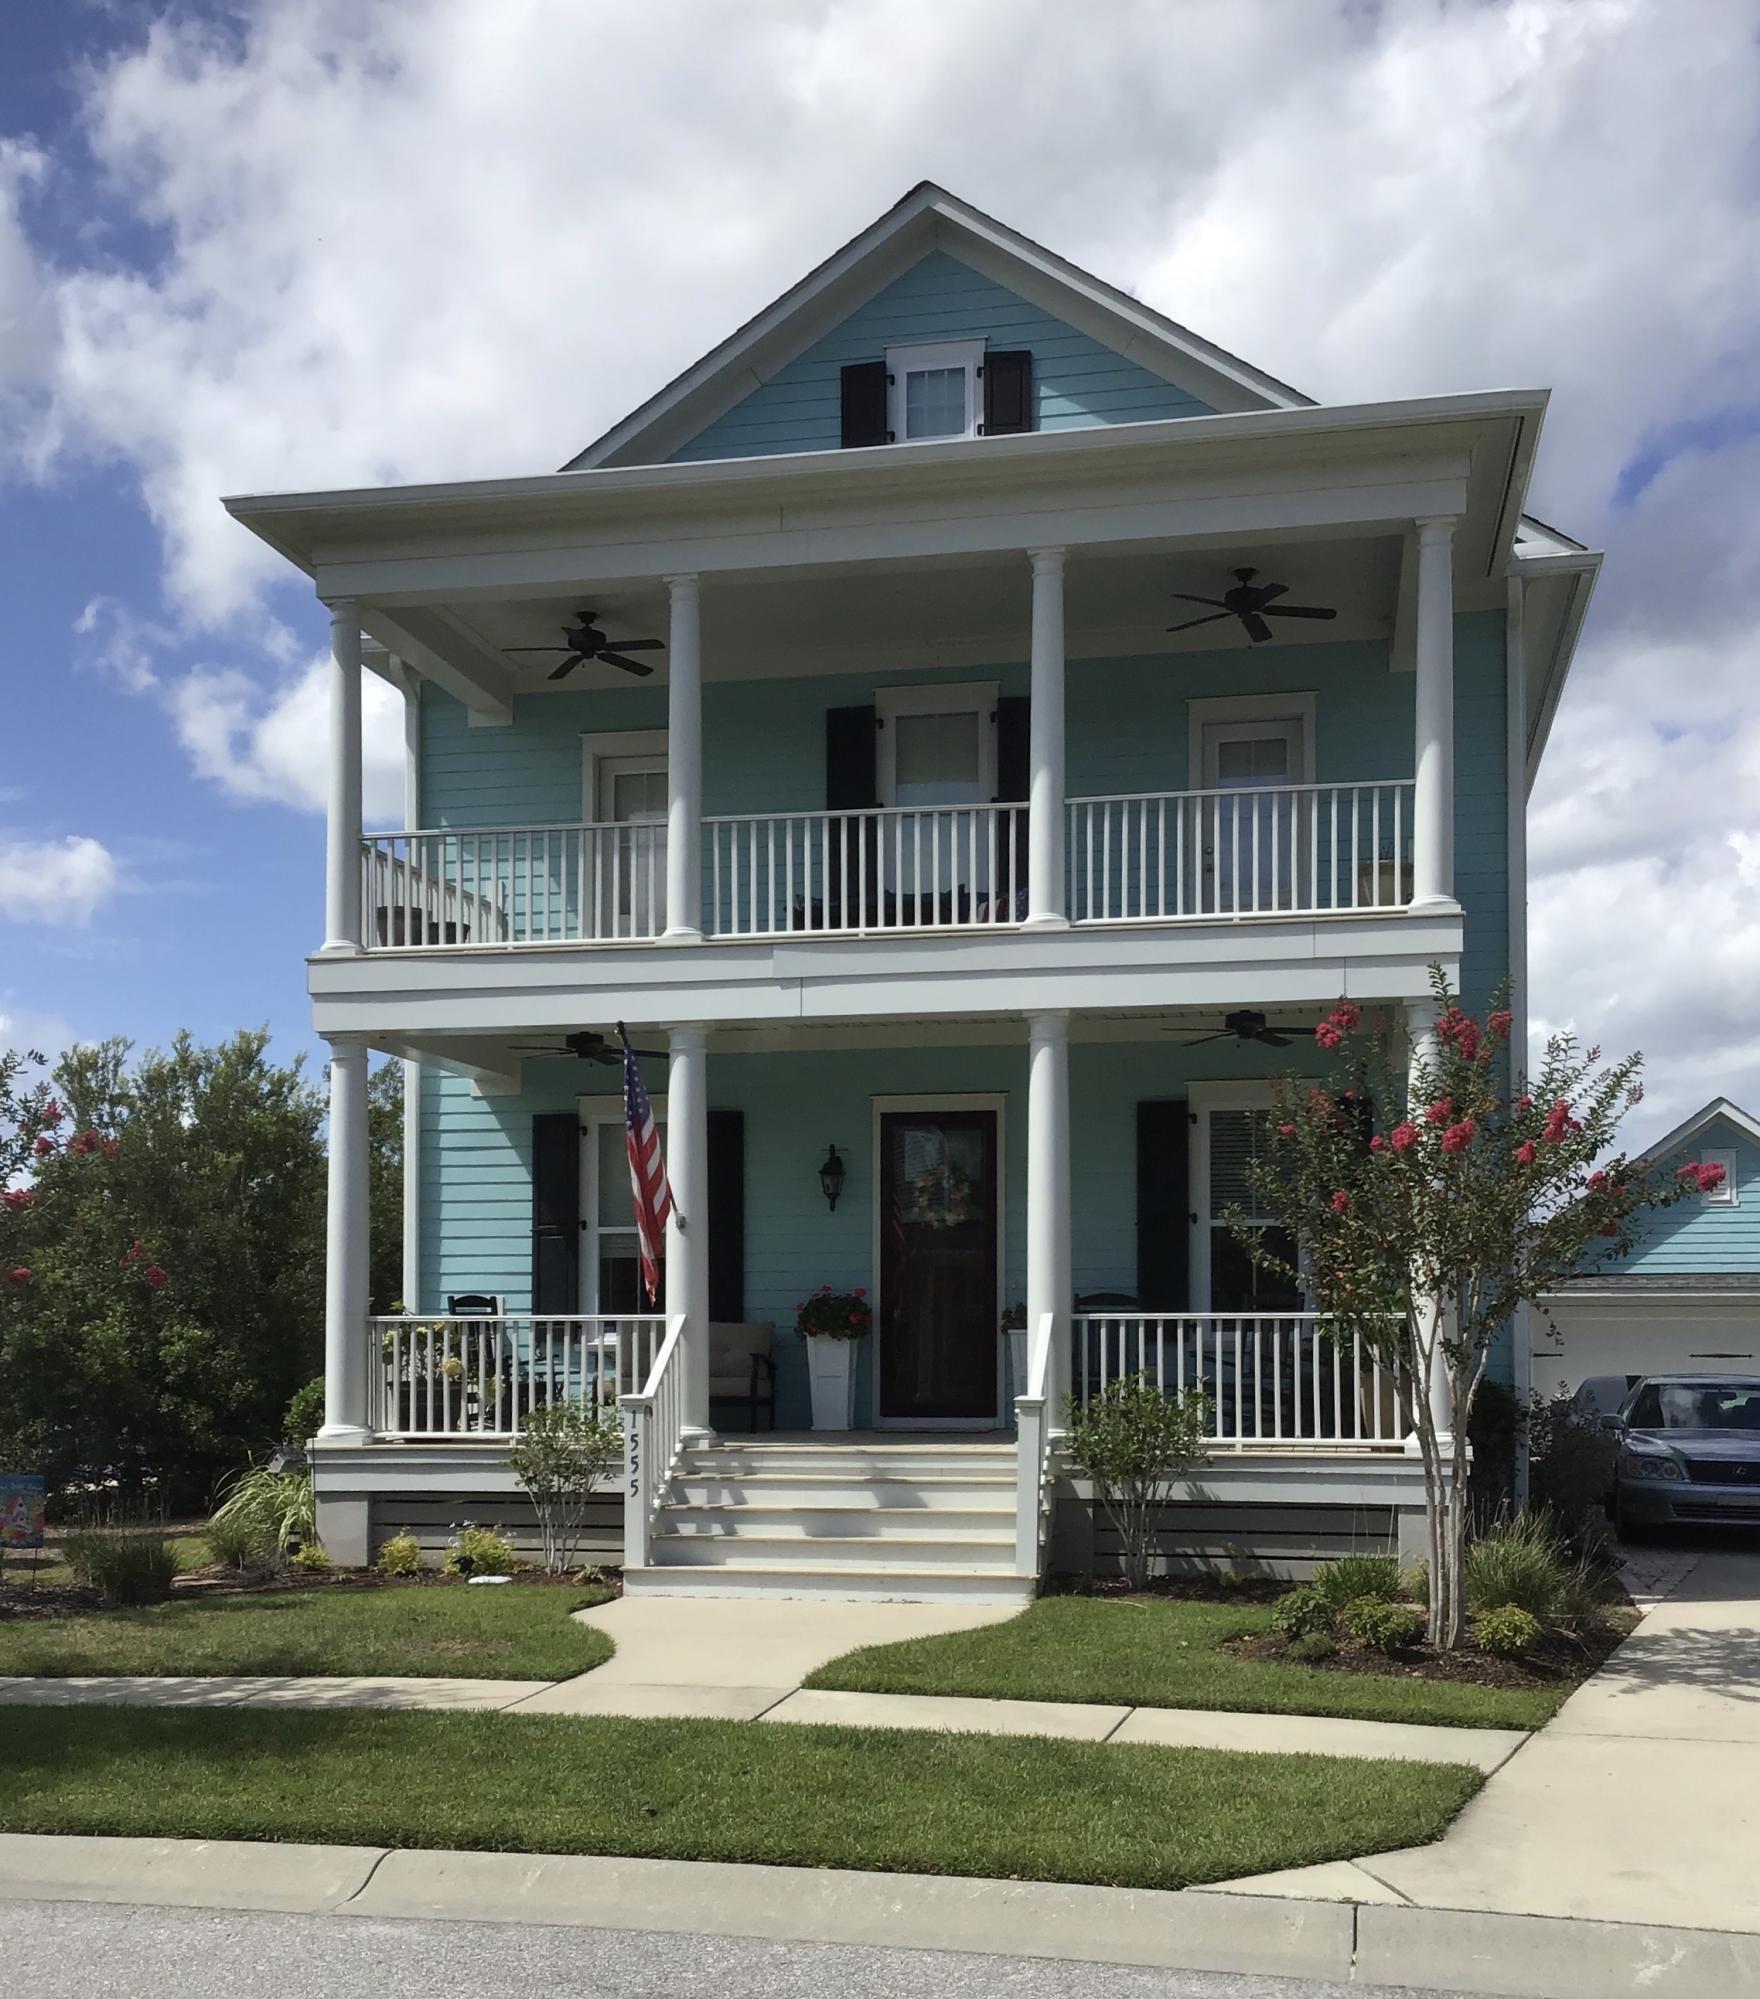 Carolina Park Homes For Sale - 1555 Watt Pond, Mount Pleasant, SC - 0